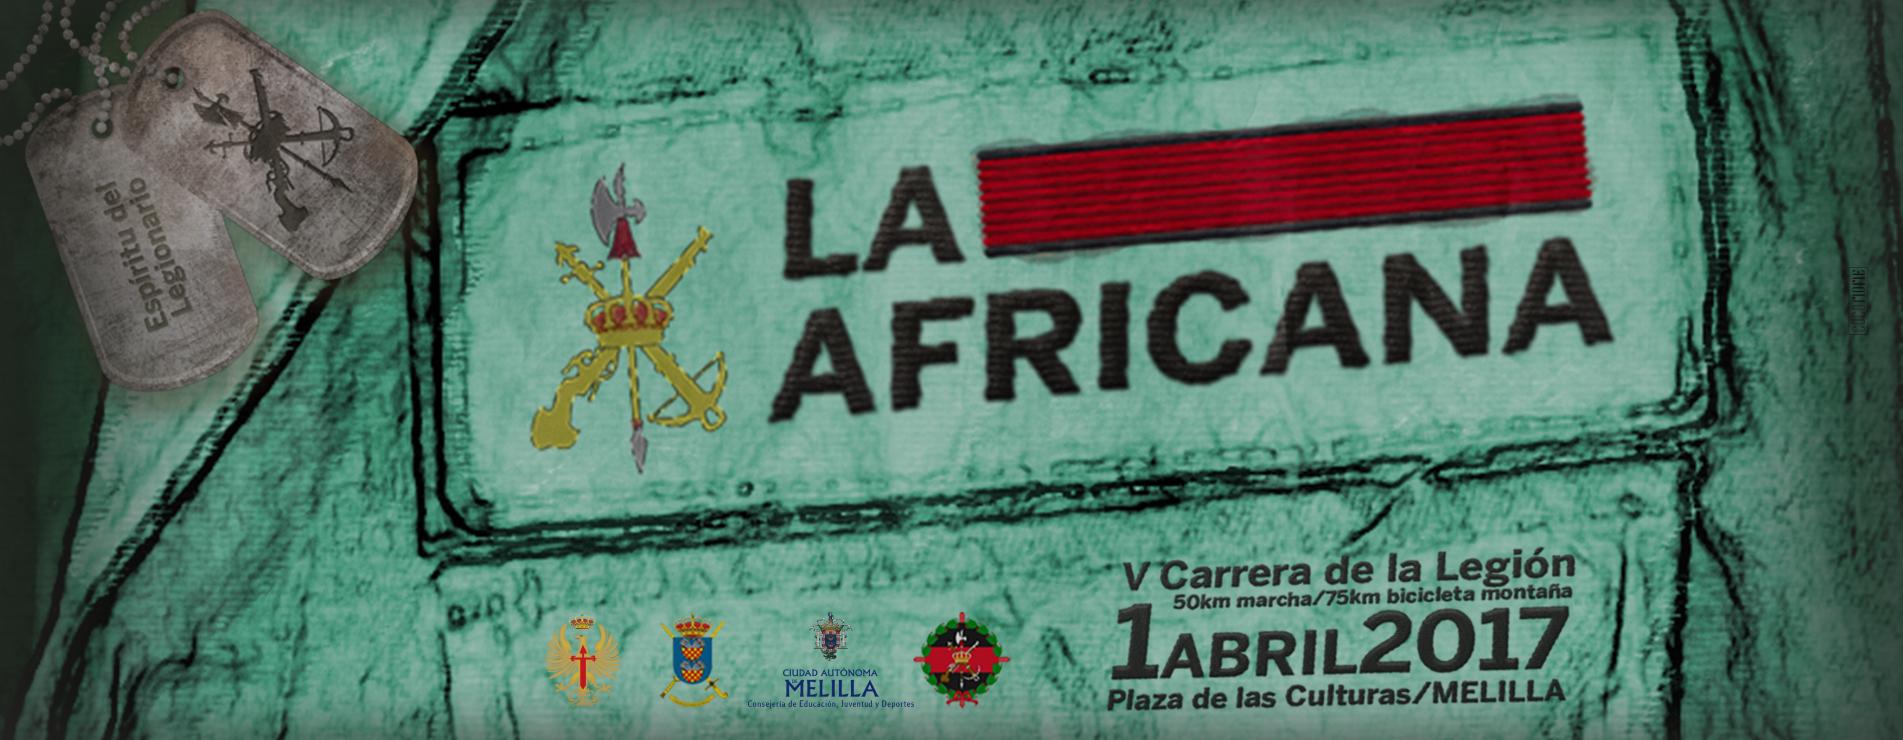 Africana-2017-web